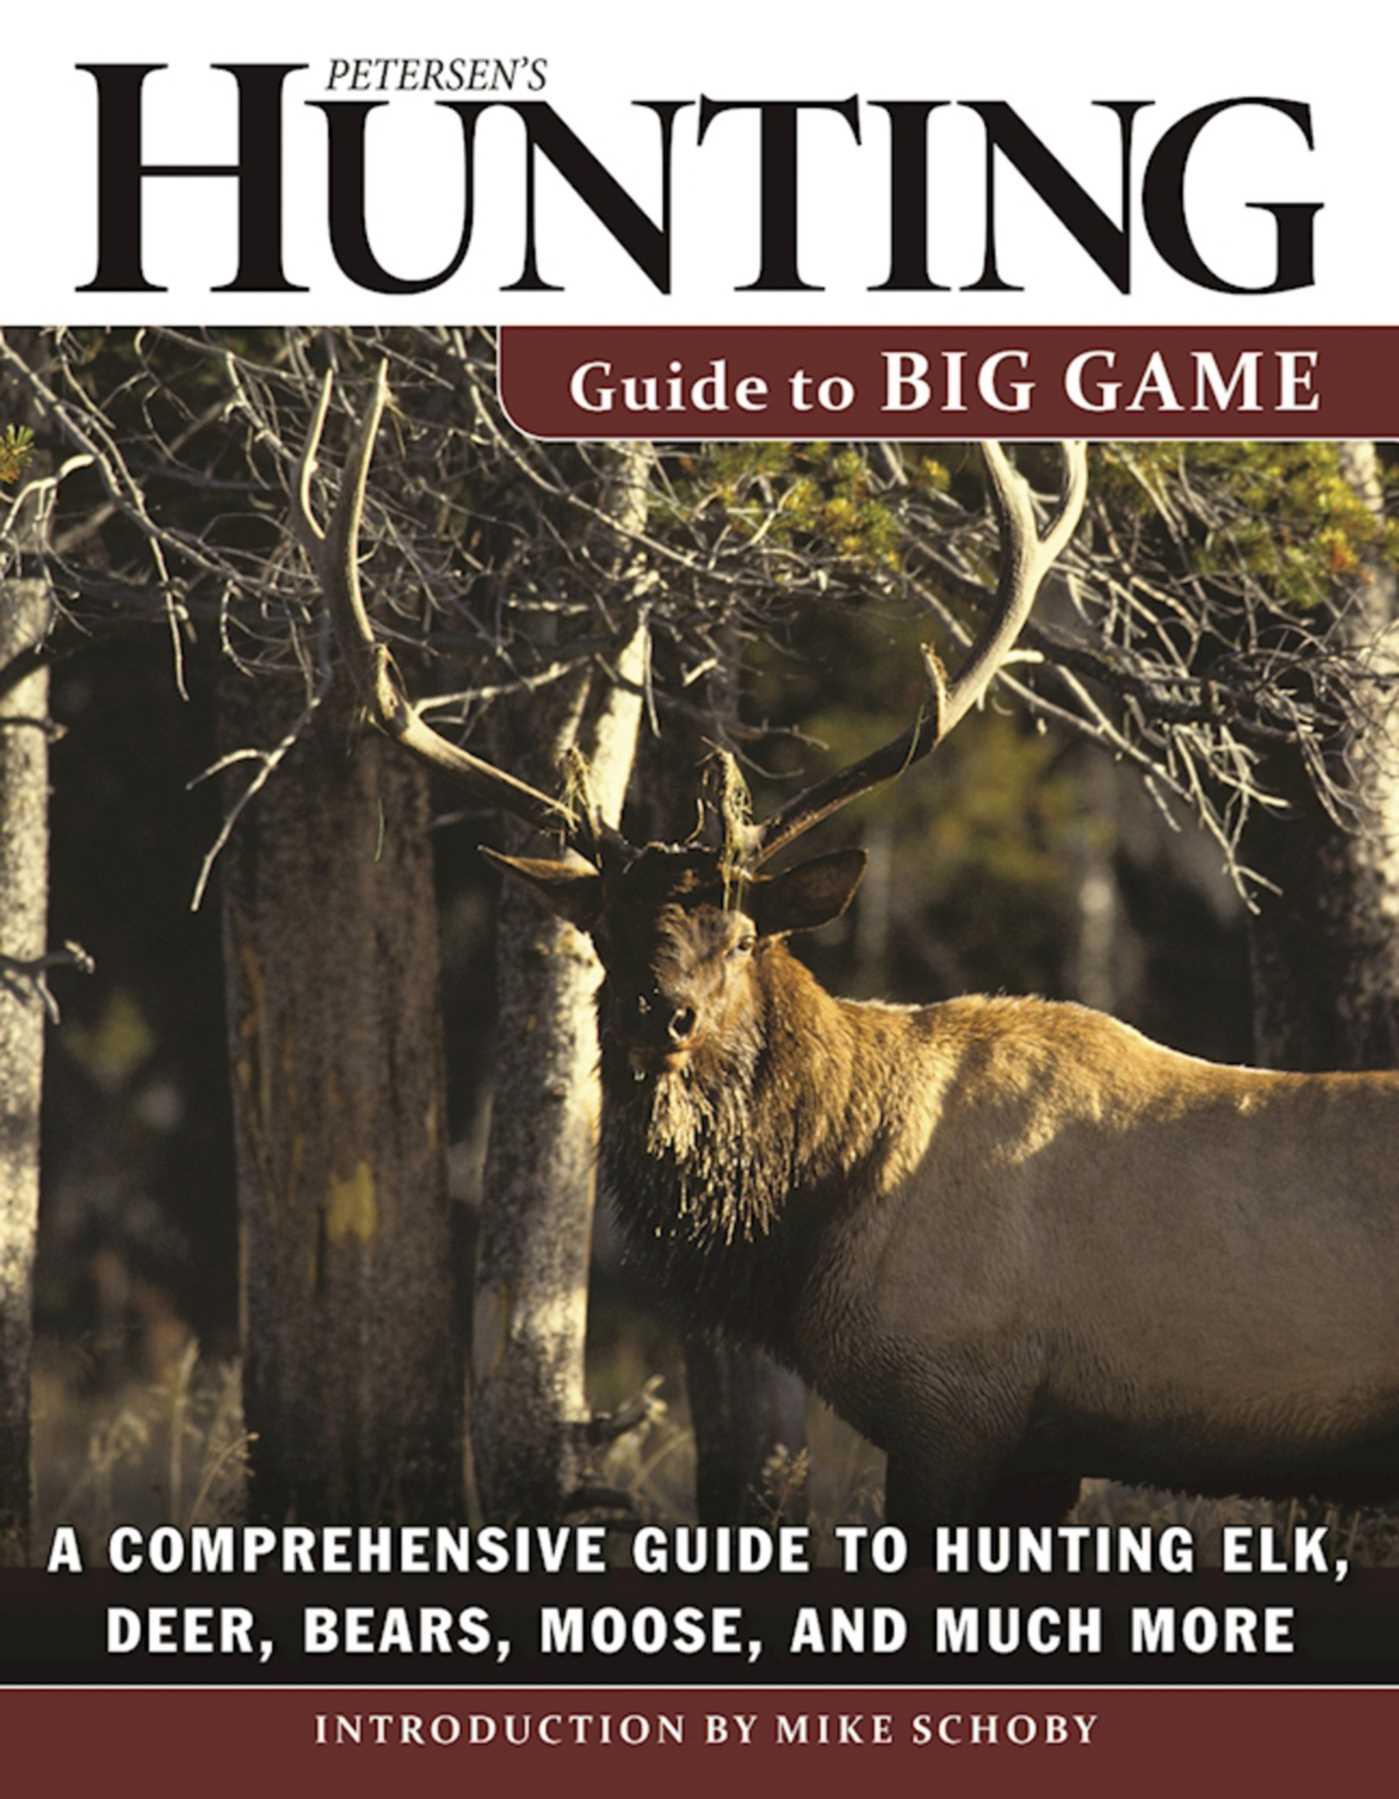 pet petersens hunting guide - HD1399×1799